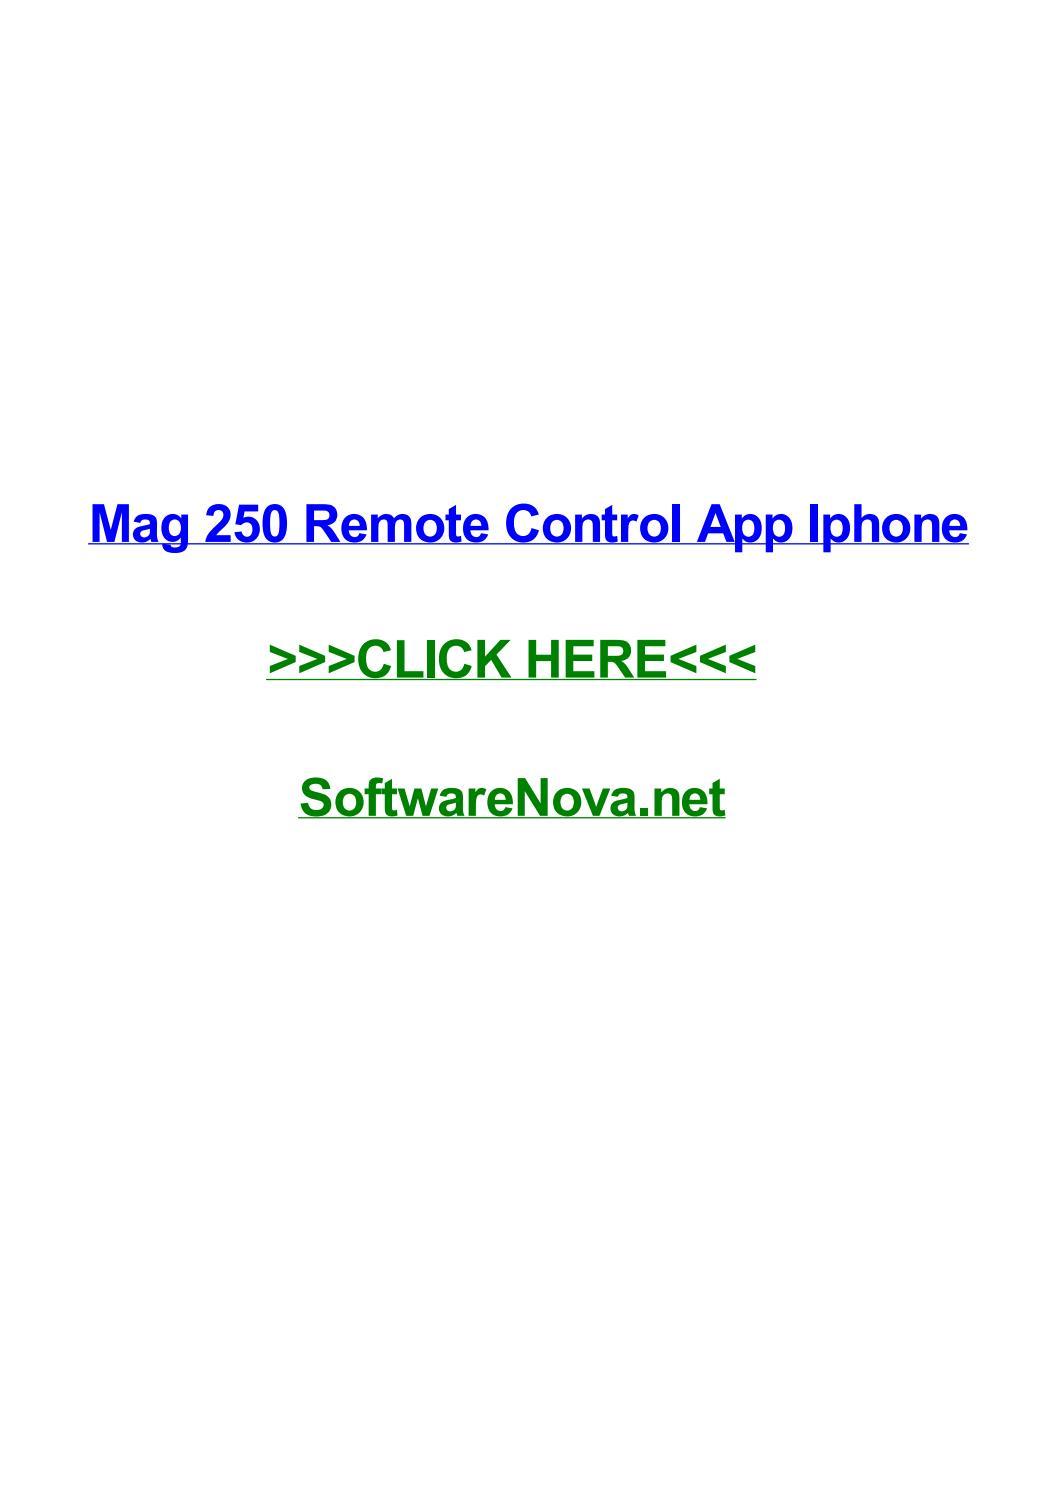 Mag 250 remote control app iphone by bryaneshdp - issuu